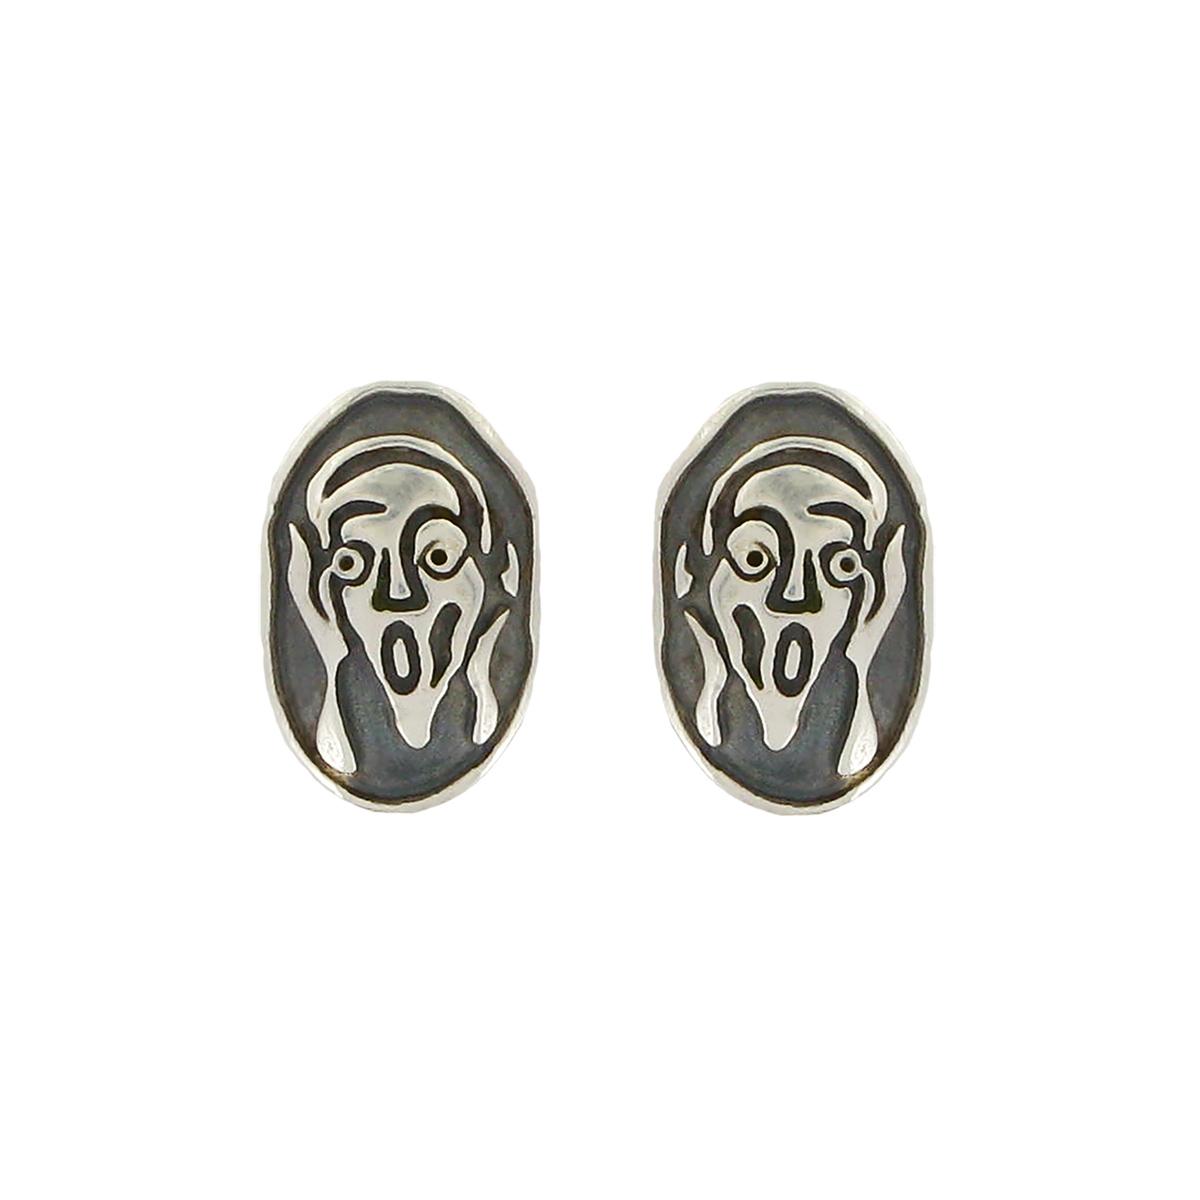 The Scream stud earrings